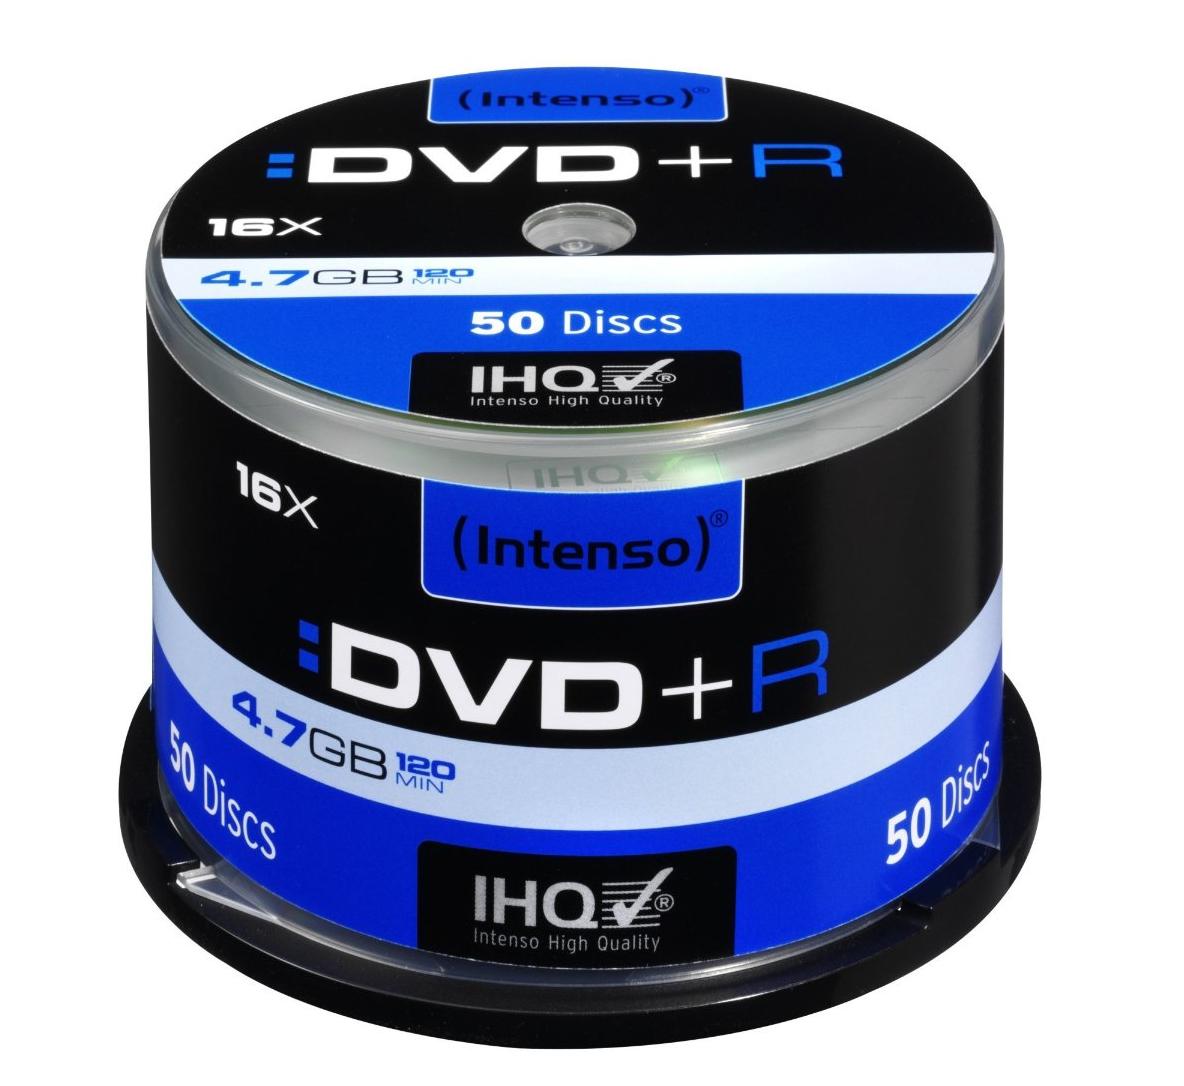 Intenso DVD+R 4.7GB 16x, 50er Spindel